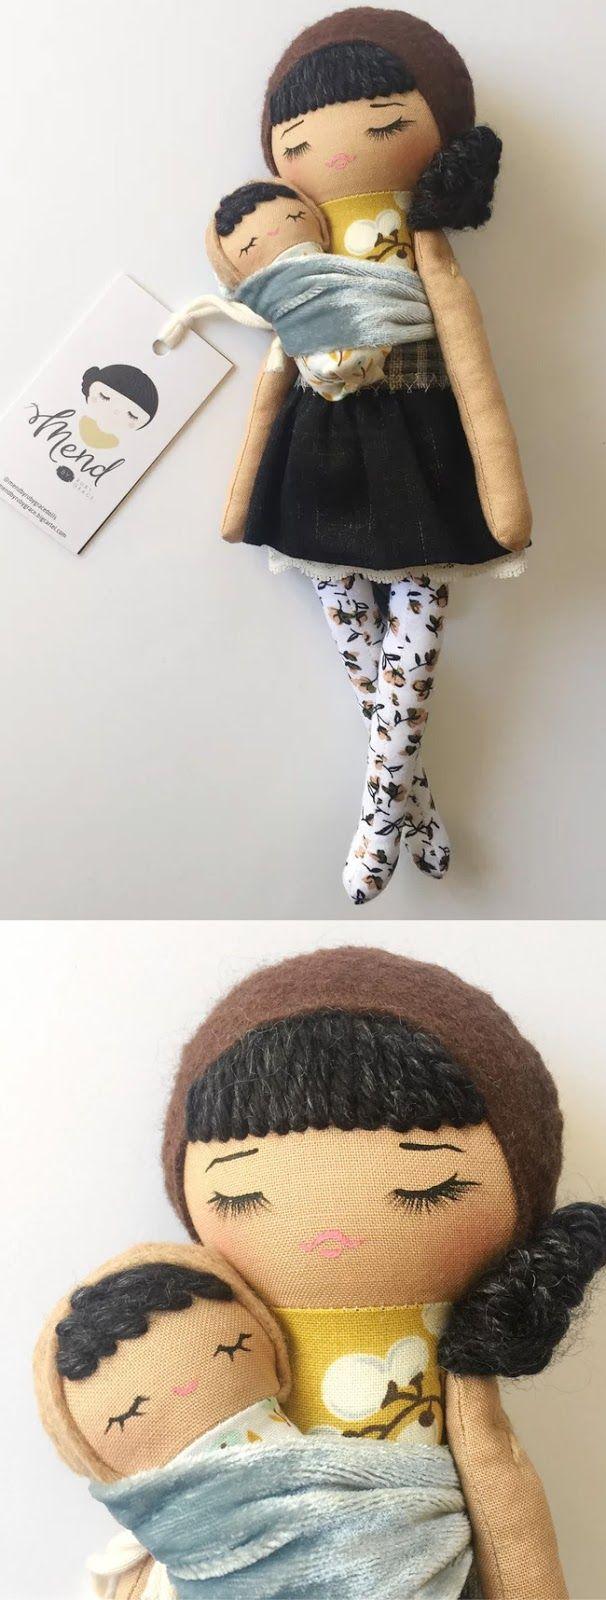 Mend by Ruby Grace dolls